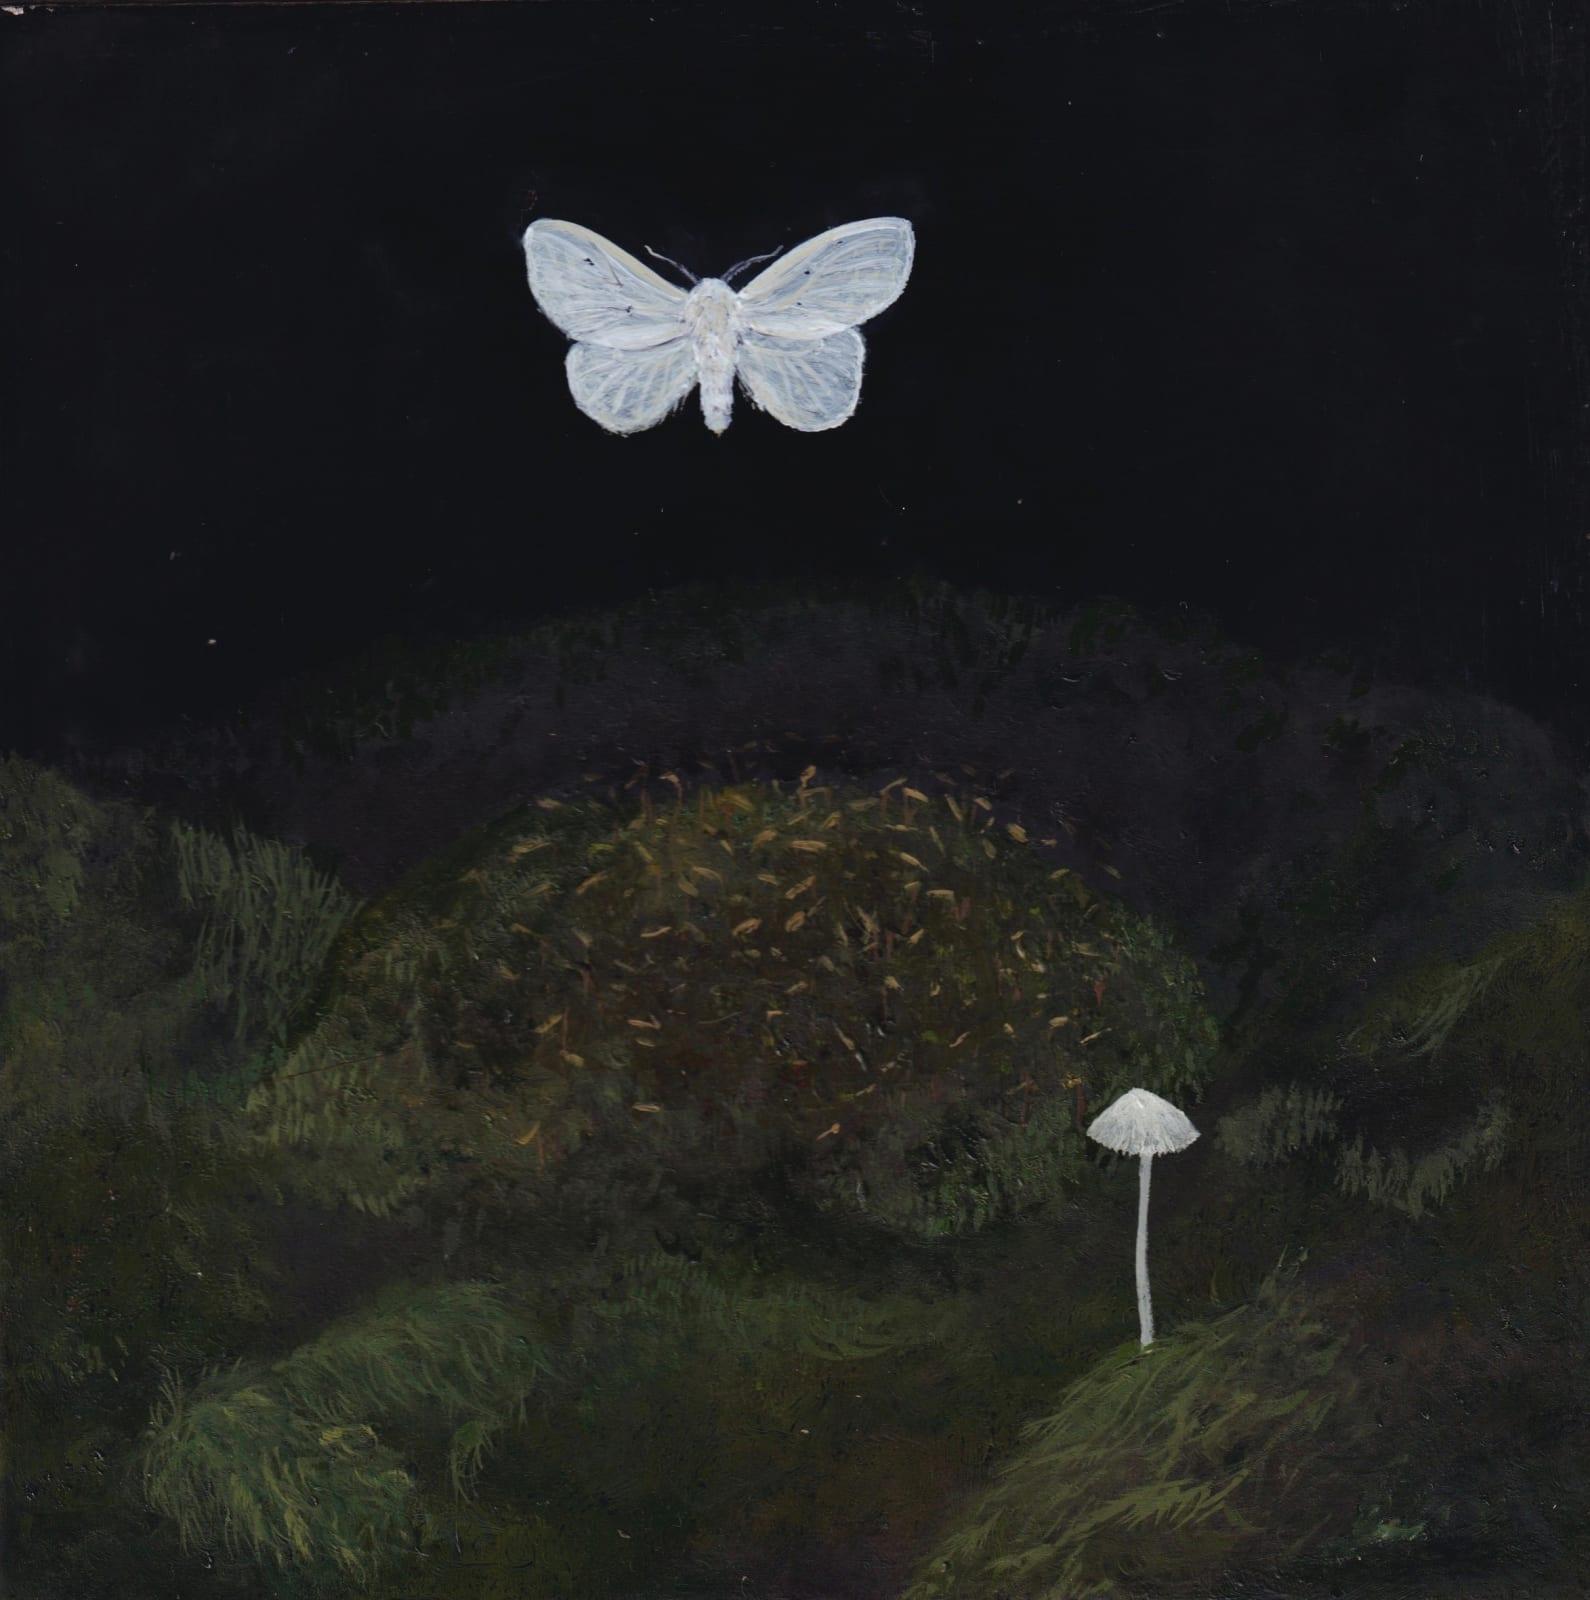 Melanie Miller, Satin Moth, 2020